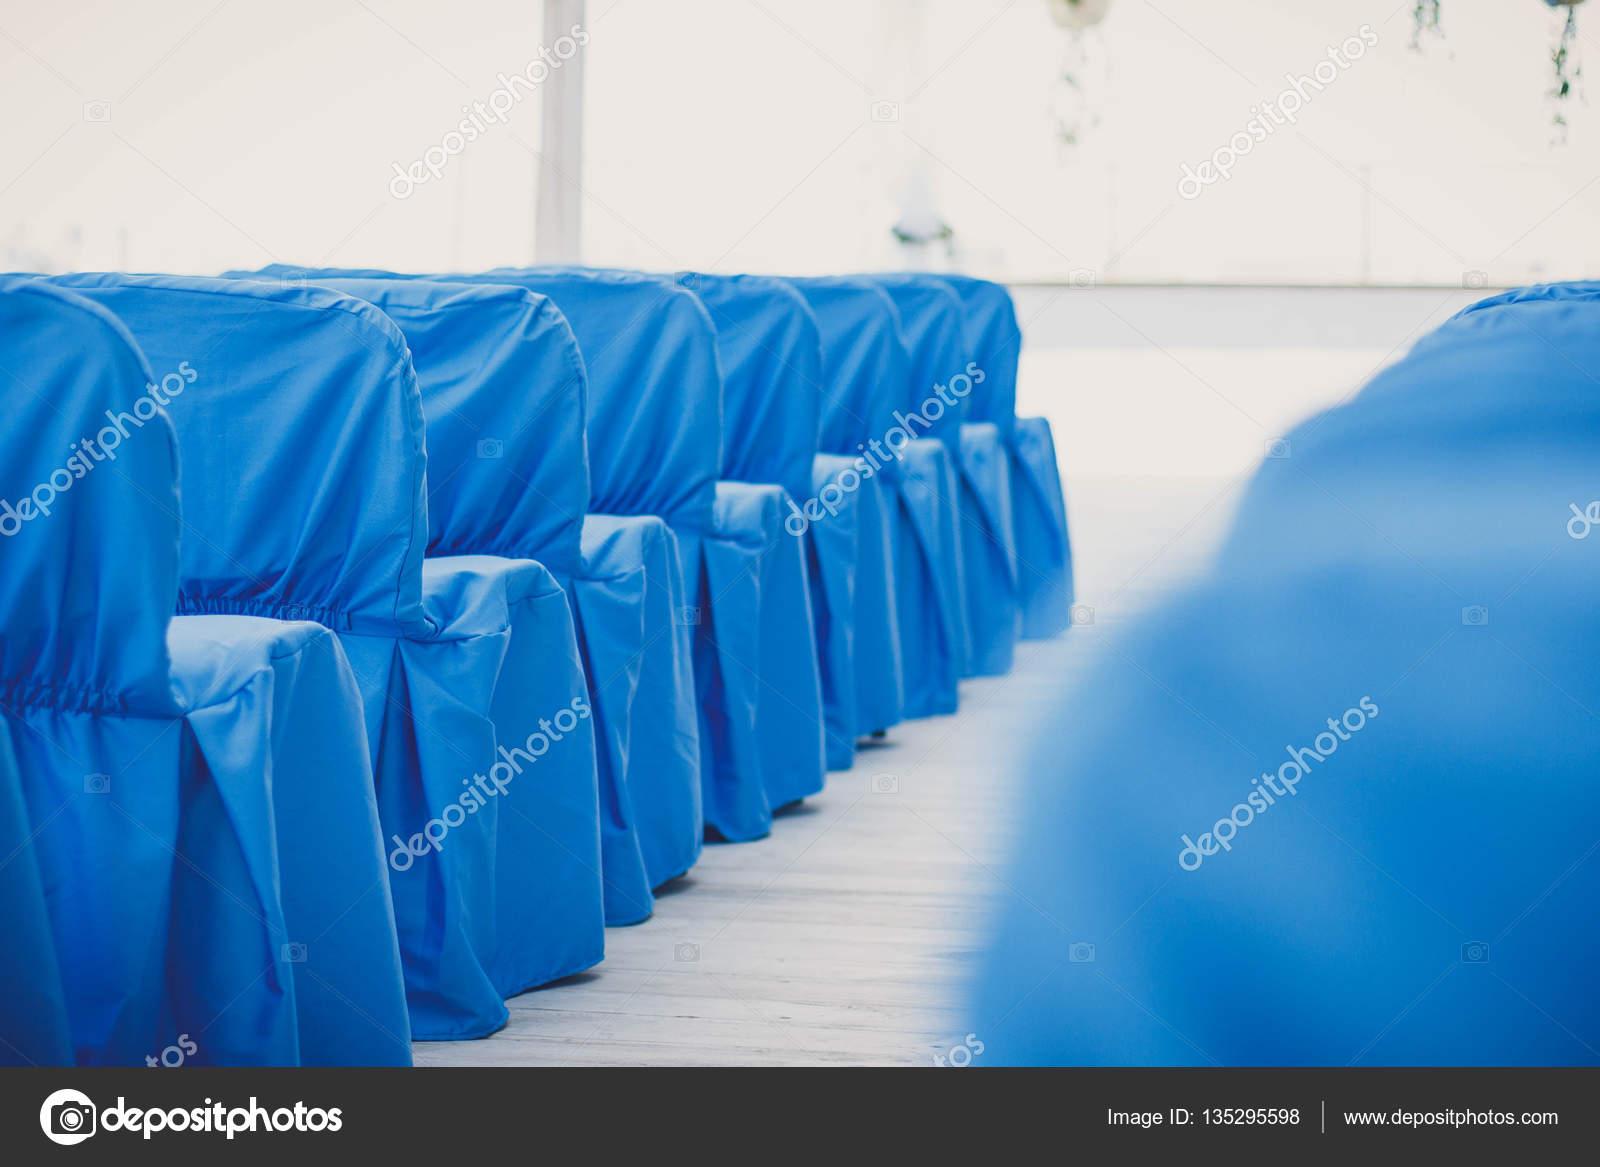 Remarkable Decorated Blue Wedding Chairs Stock Photo C Cellar Door Download Free Architecture Designs Sospemadebymaigaardcom